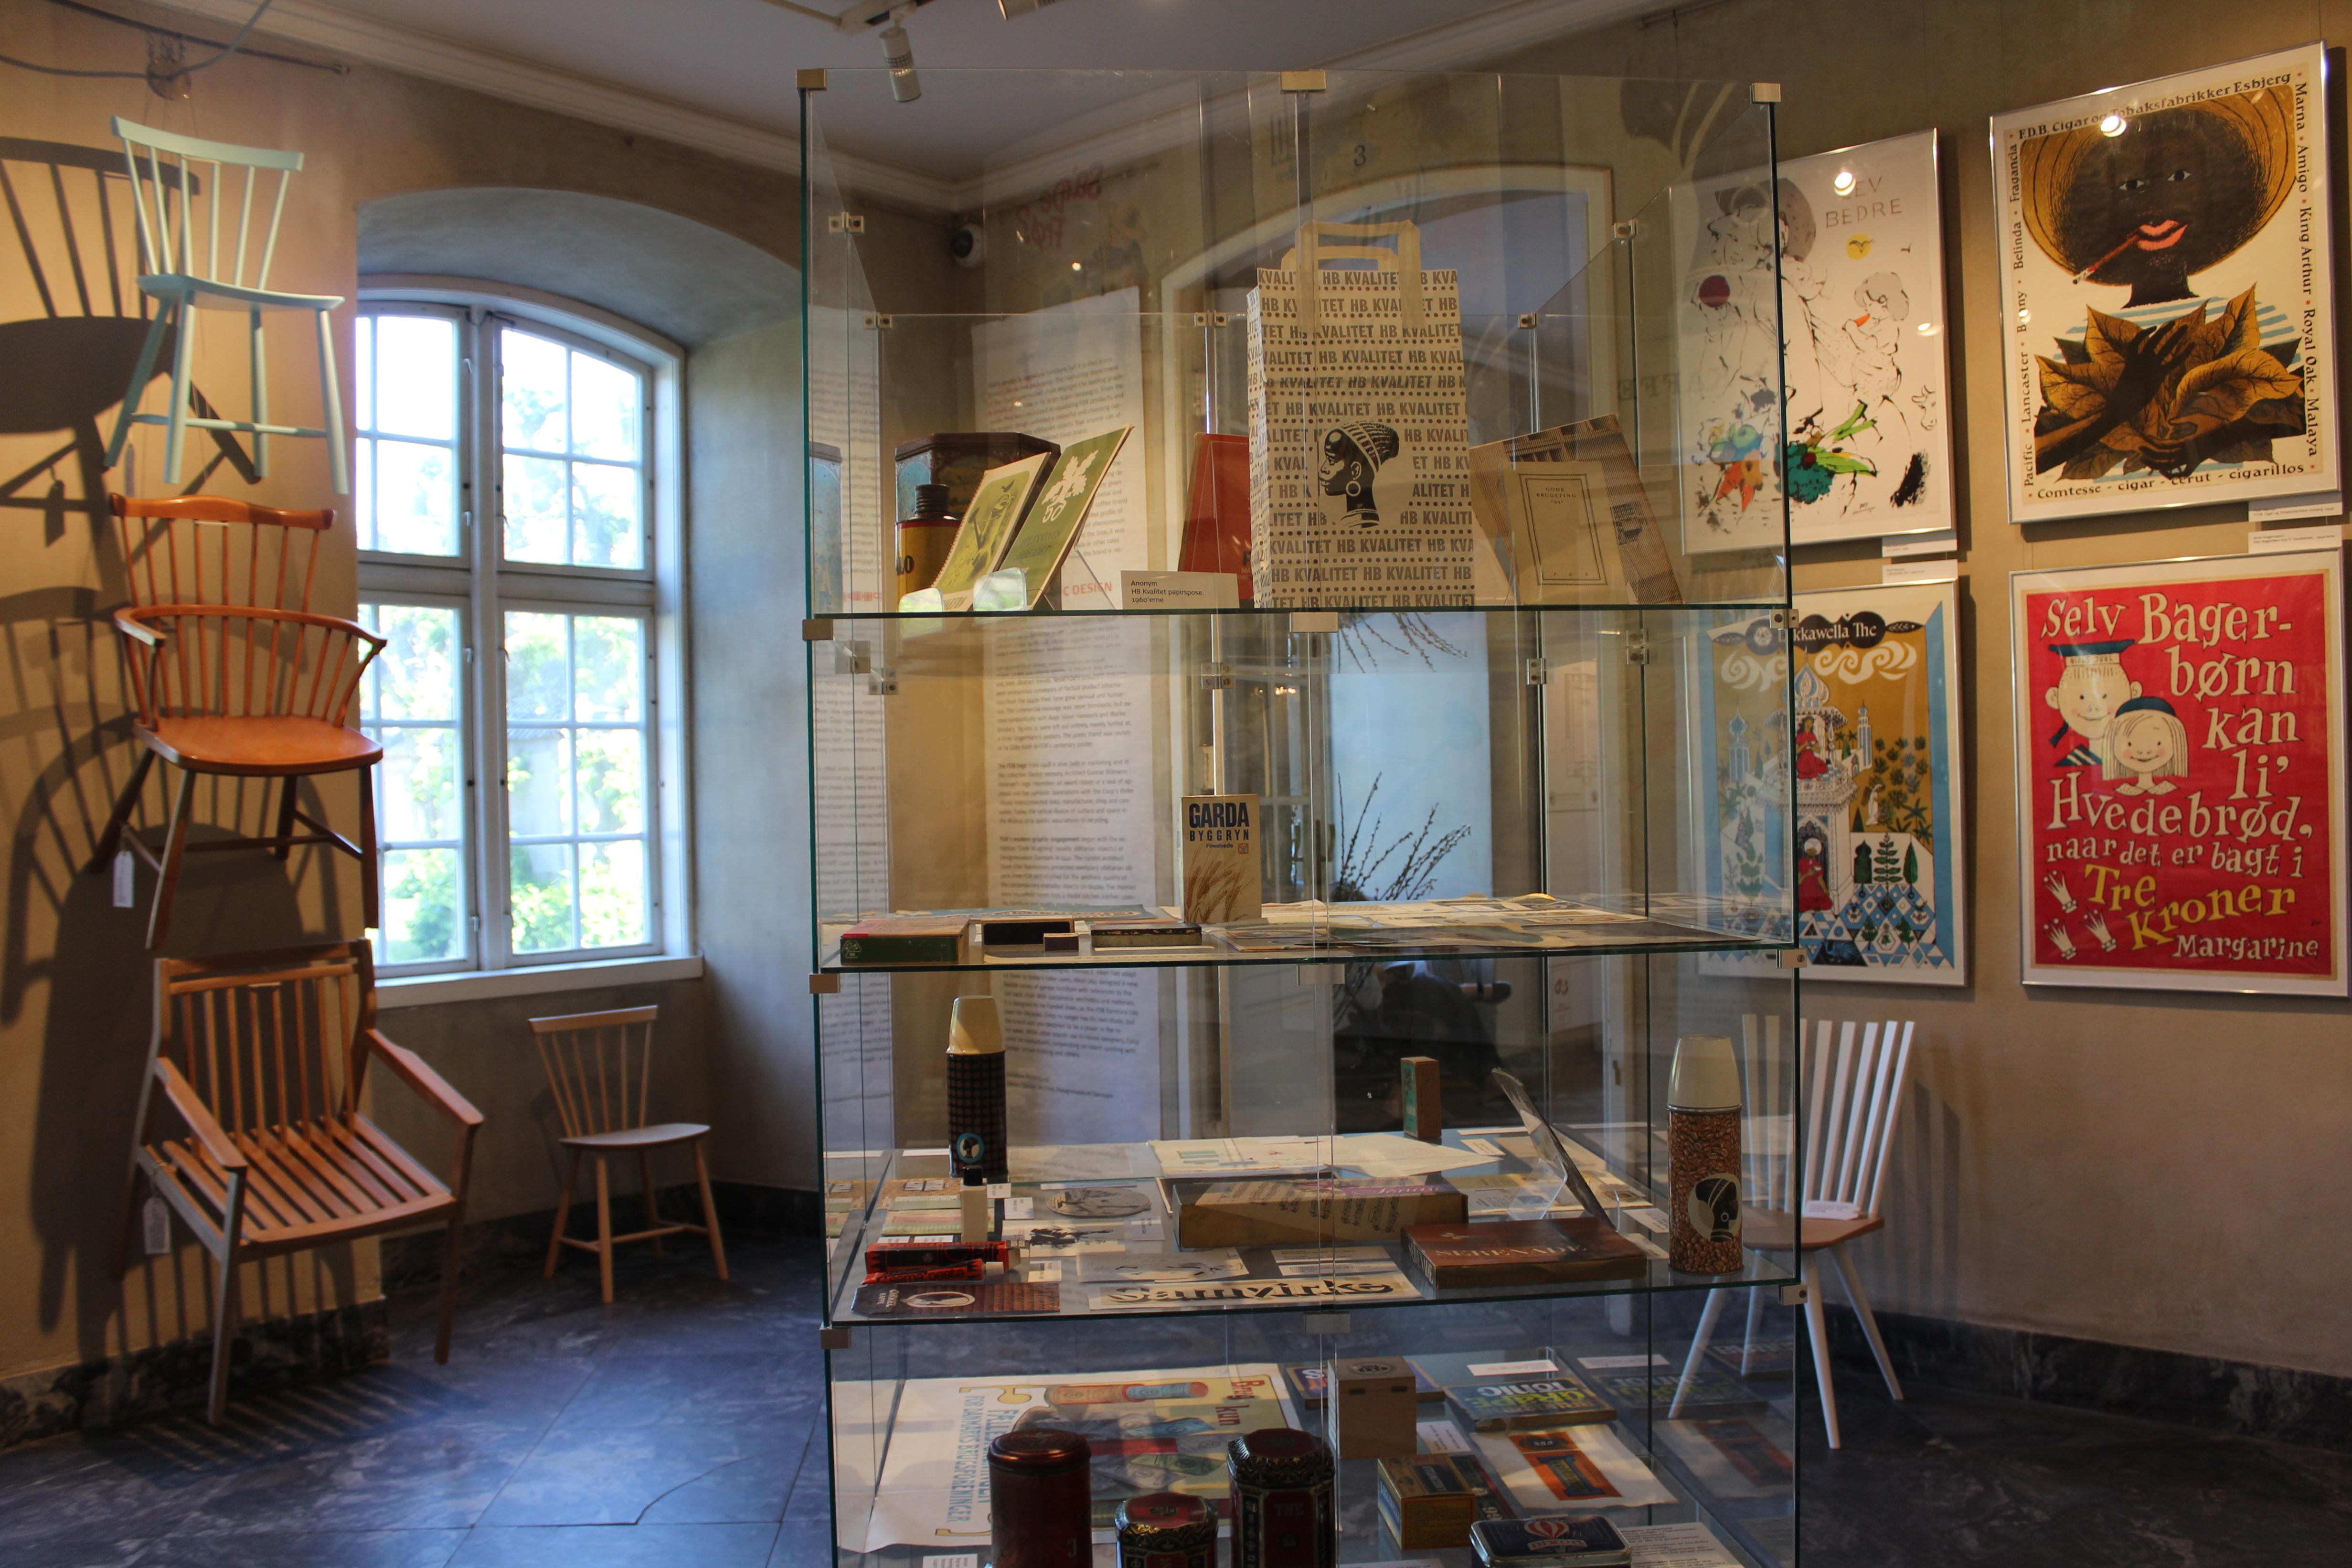 designmuseum danmark copenhagen denmark attractions lonely planet. Black Bedroom Furniture Sets. Home Design Ideas